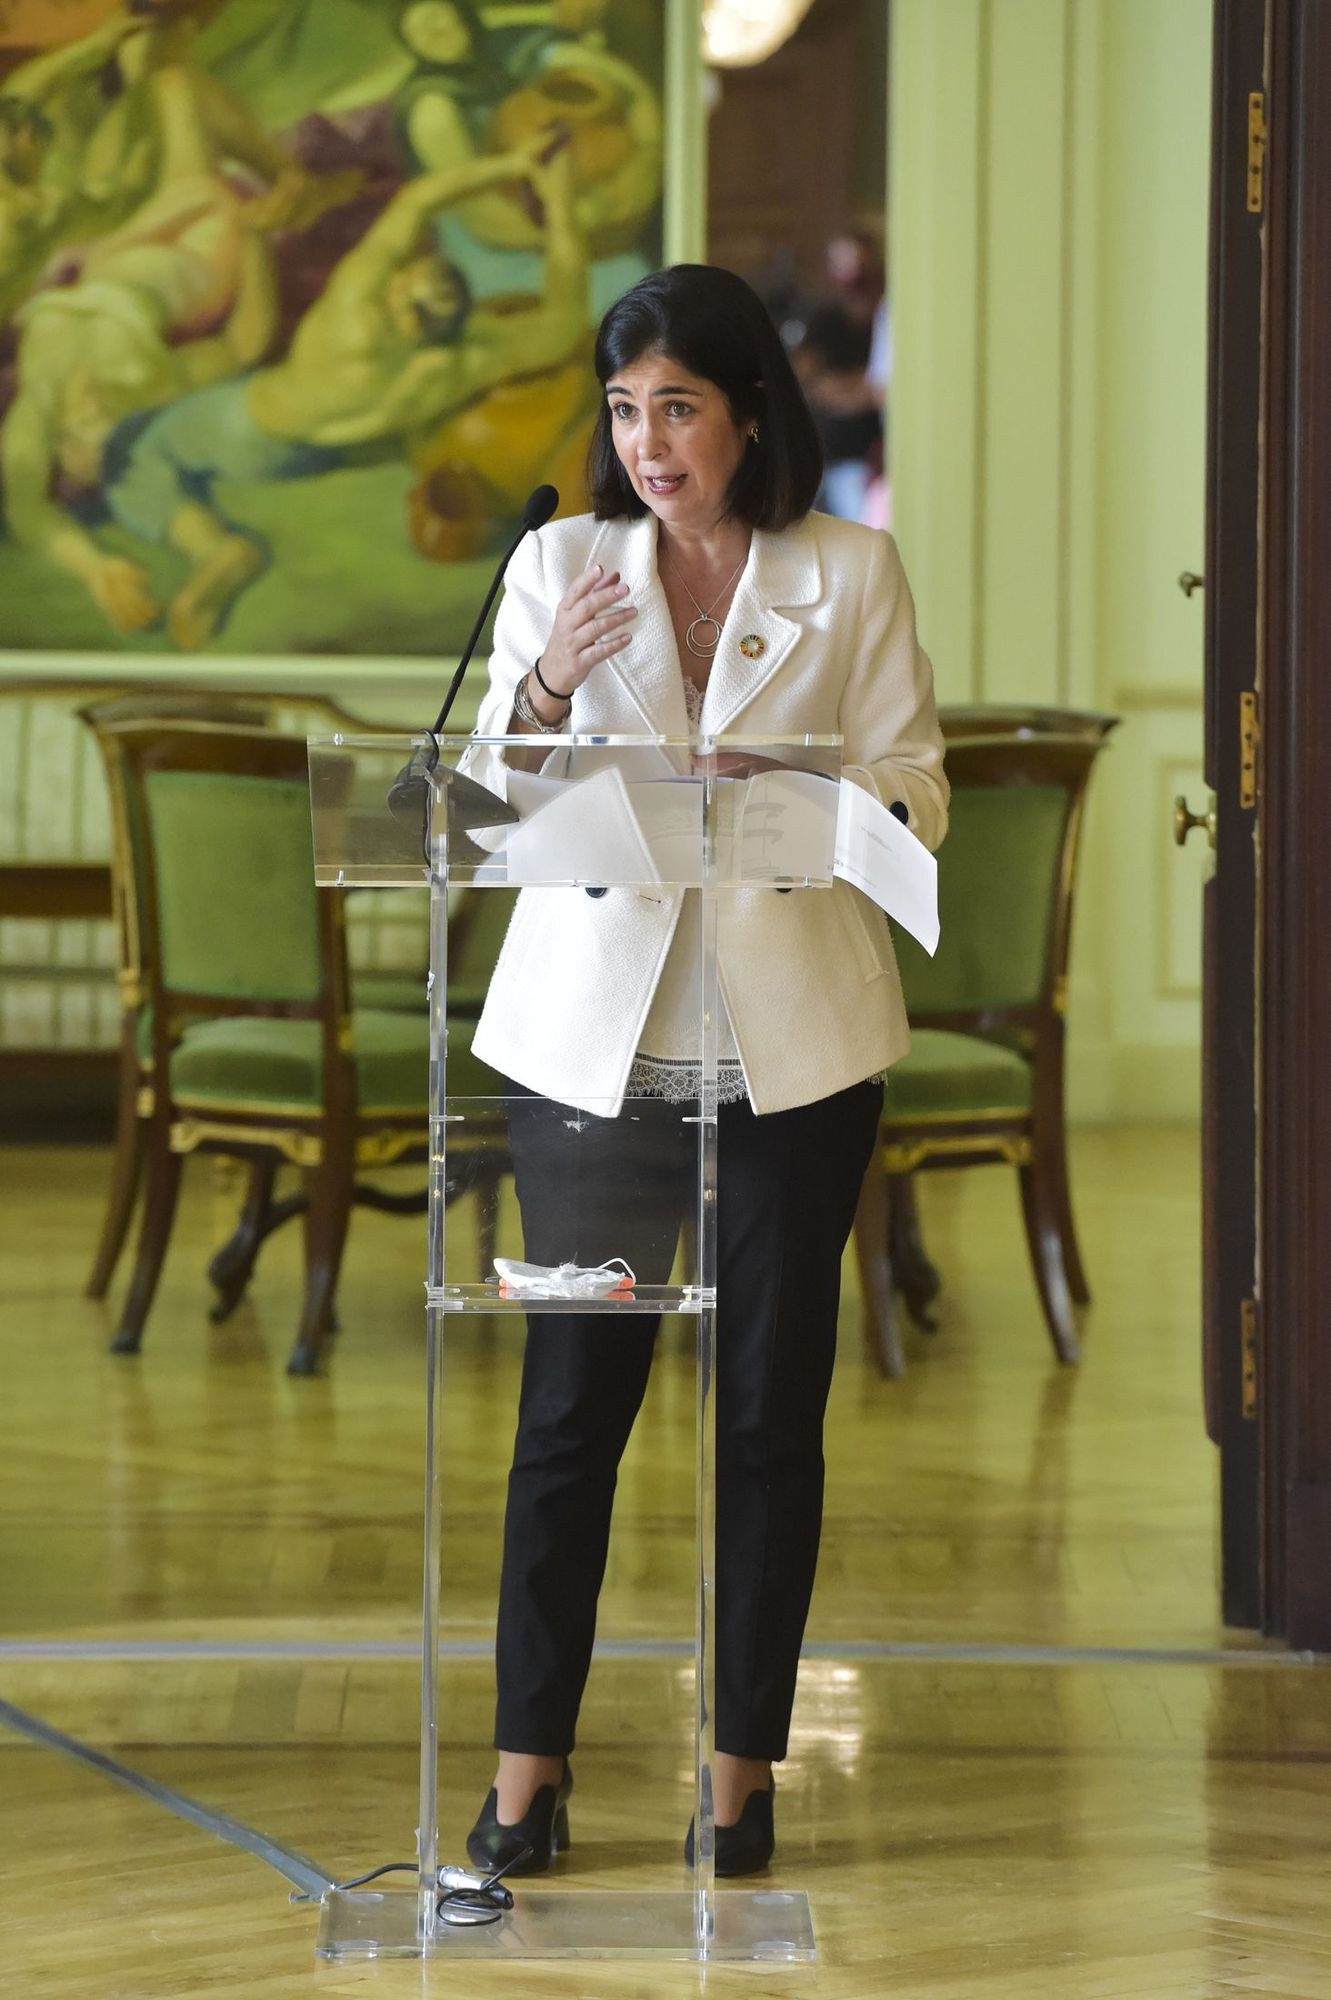 Reunión de Carolina Darias con los municipios de Gran Canaria afectados por catástrofes naturales